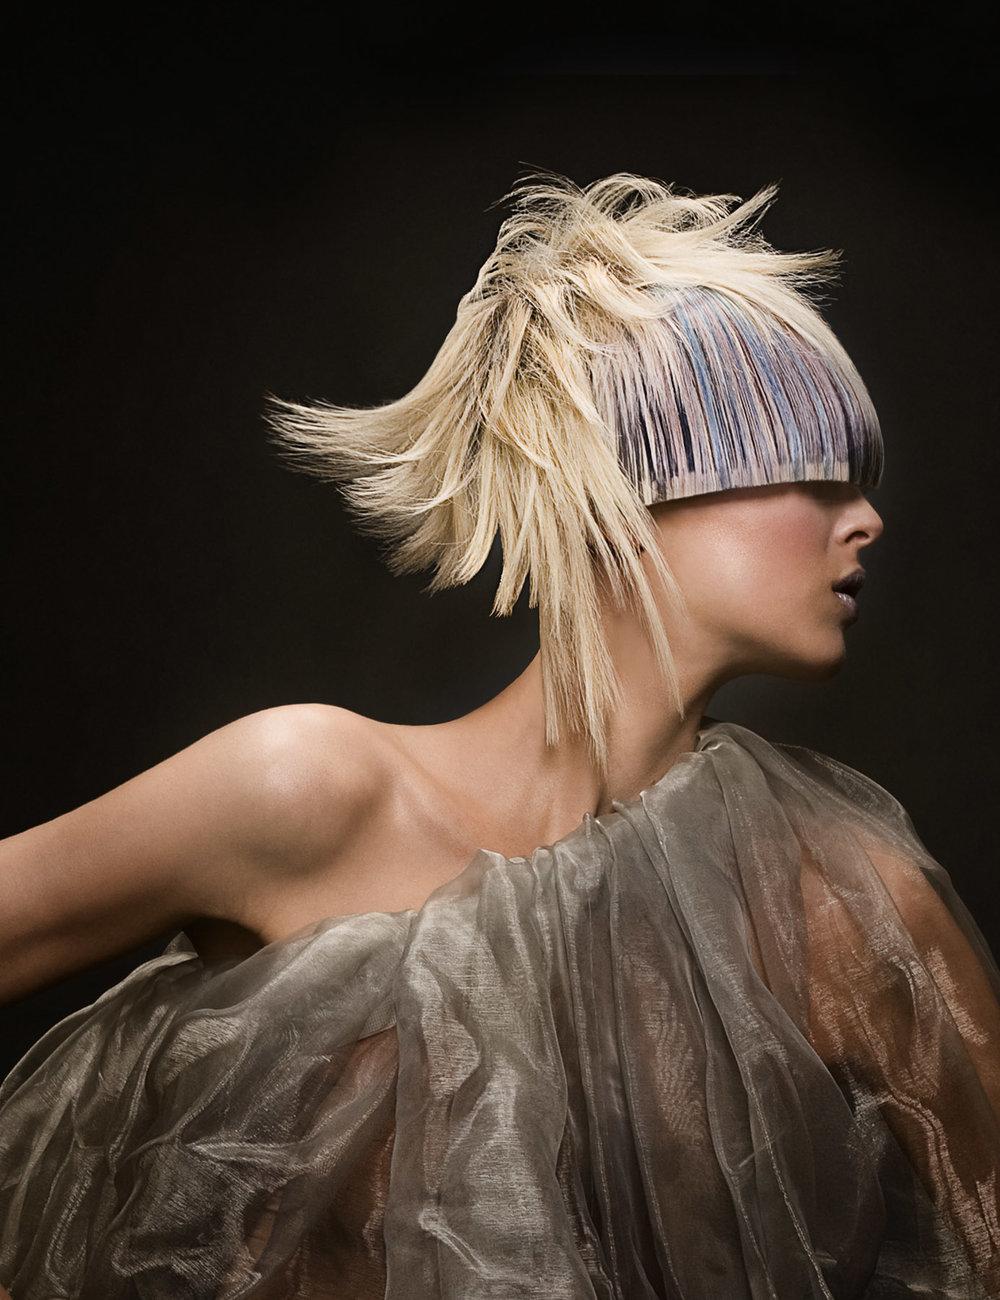 M_Alarie_Salon_Pure_HairstylistOfTheYear_02.jpg